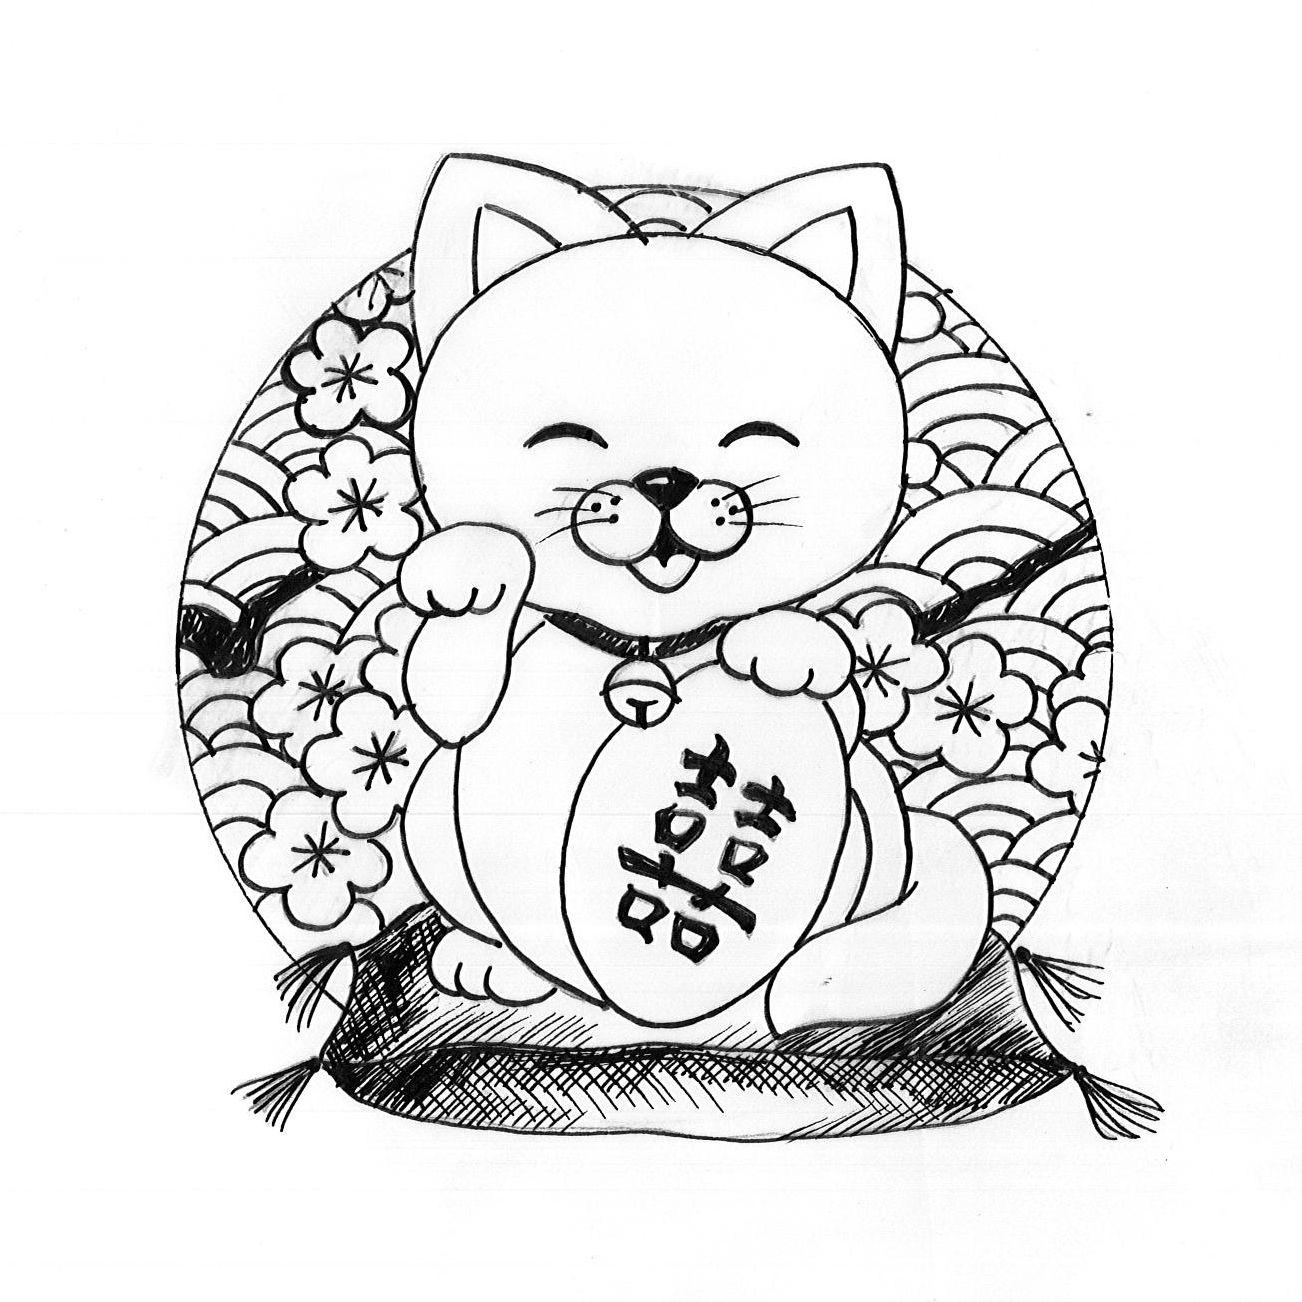 Dessin maneki neko porte bonheur fond fleuri sakura et cailles myriam lakraa cr ations sept - Cactus porte bonheur ...